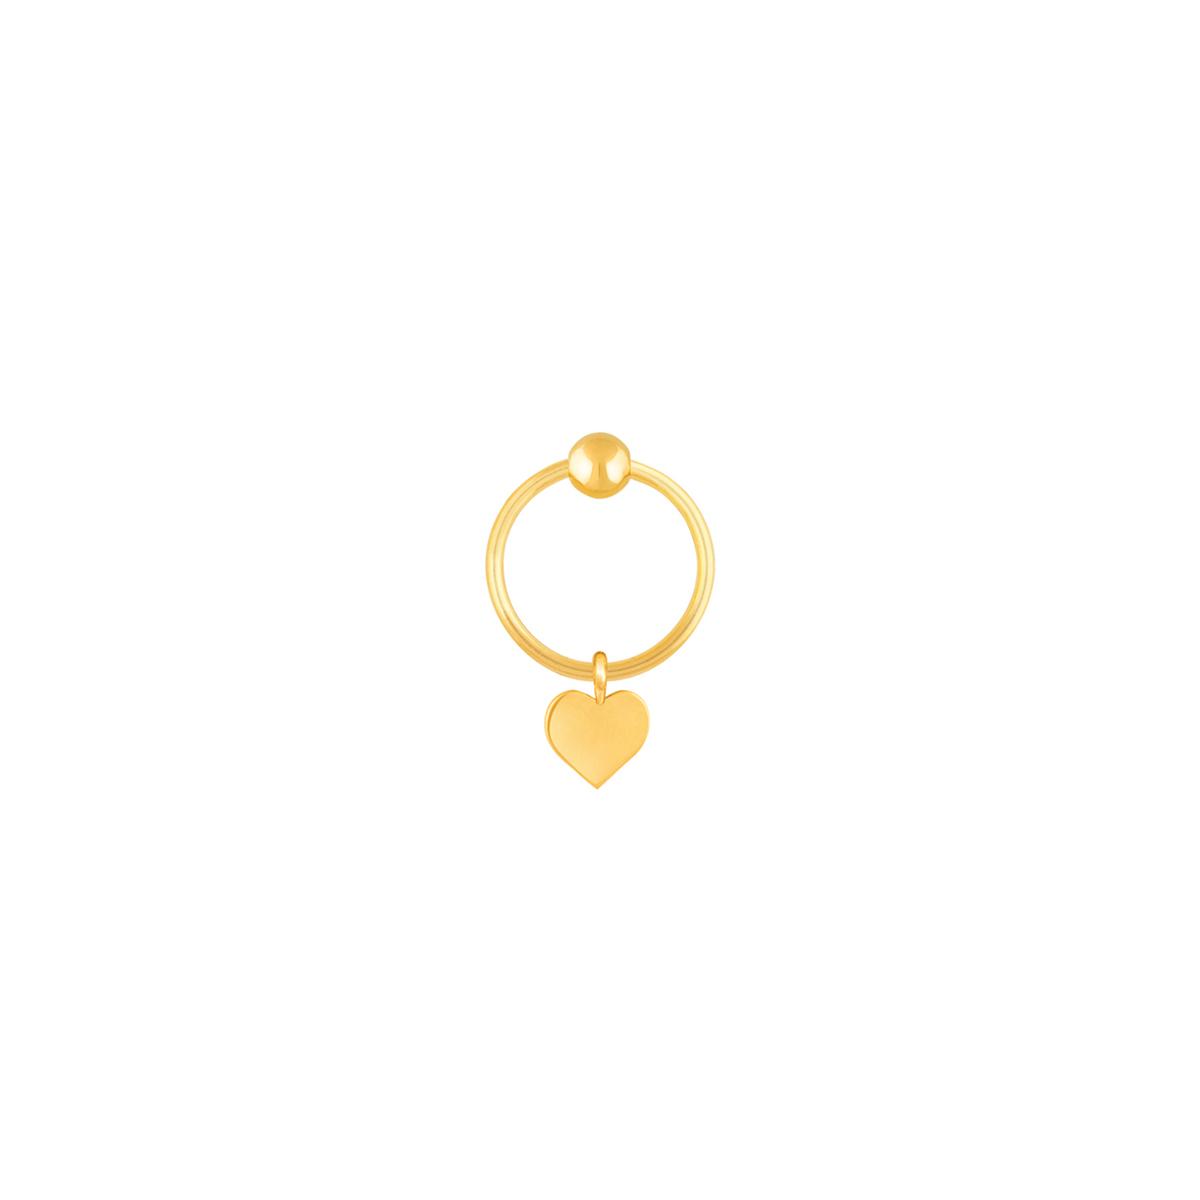 گوشواره طلا تک لنگه ای قلب و گوی